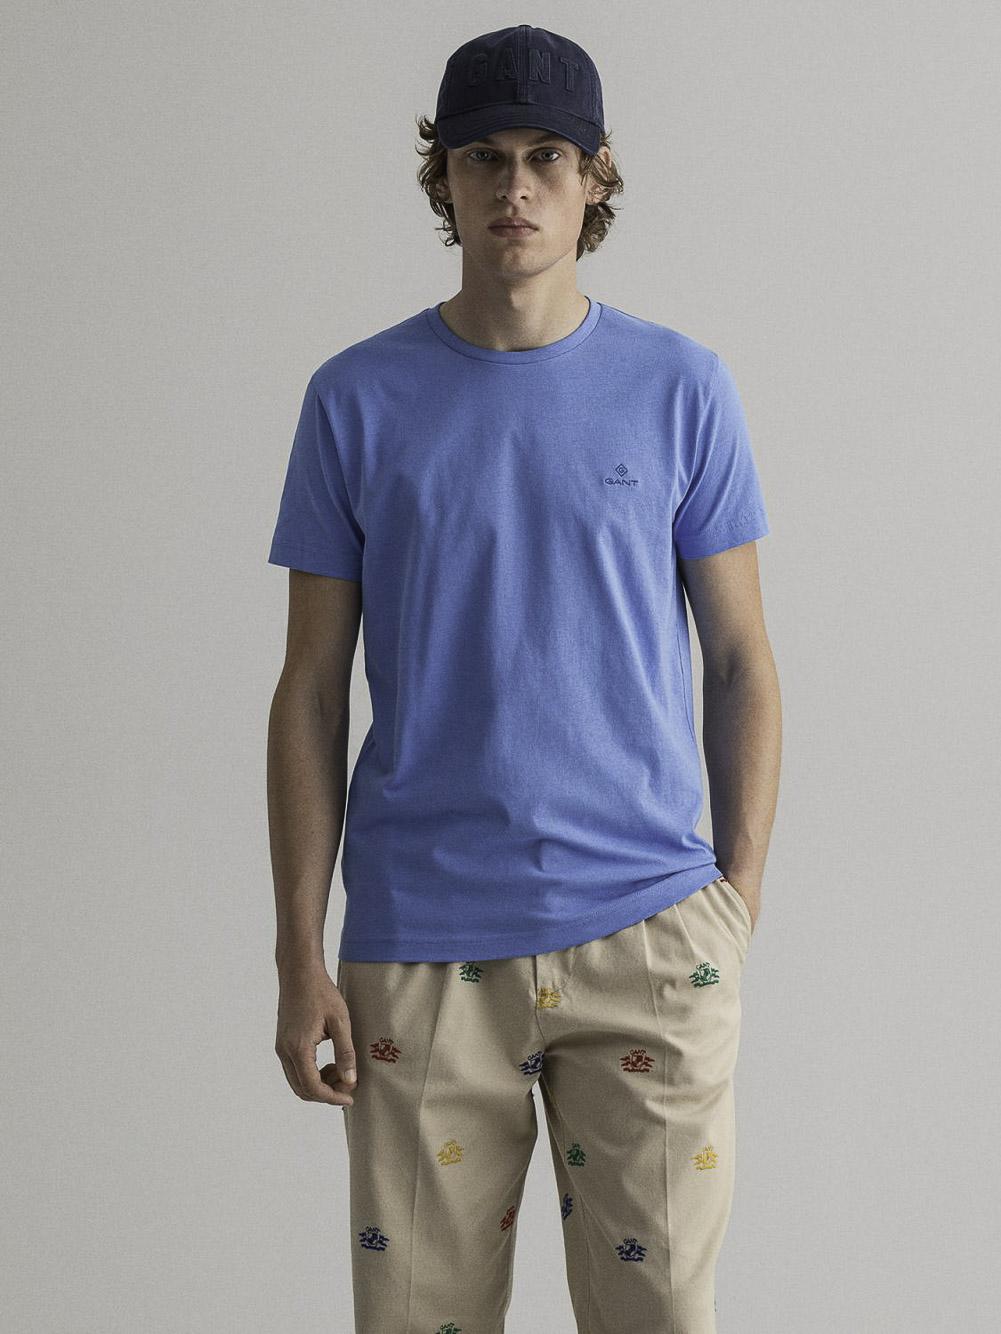 GANT Μπλούζα t-shirt 3G2053004-445 ΚΑΑΡΩ ΓΑΛΑΖΙΟ